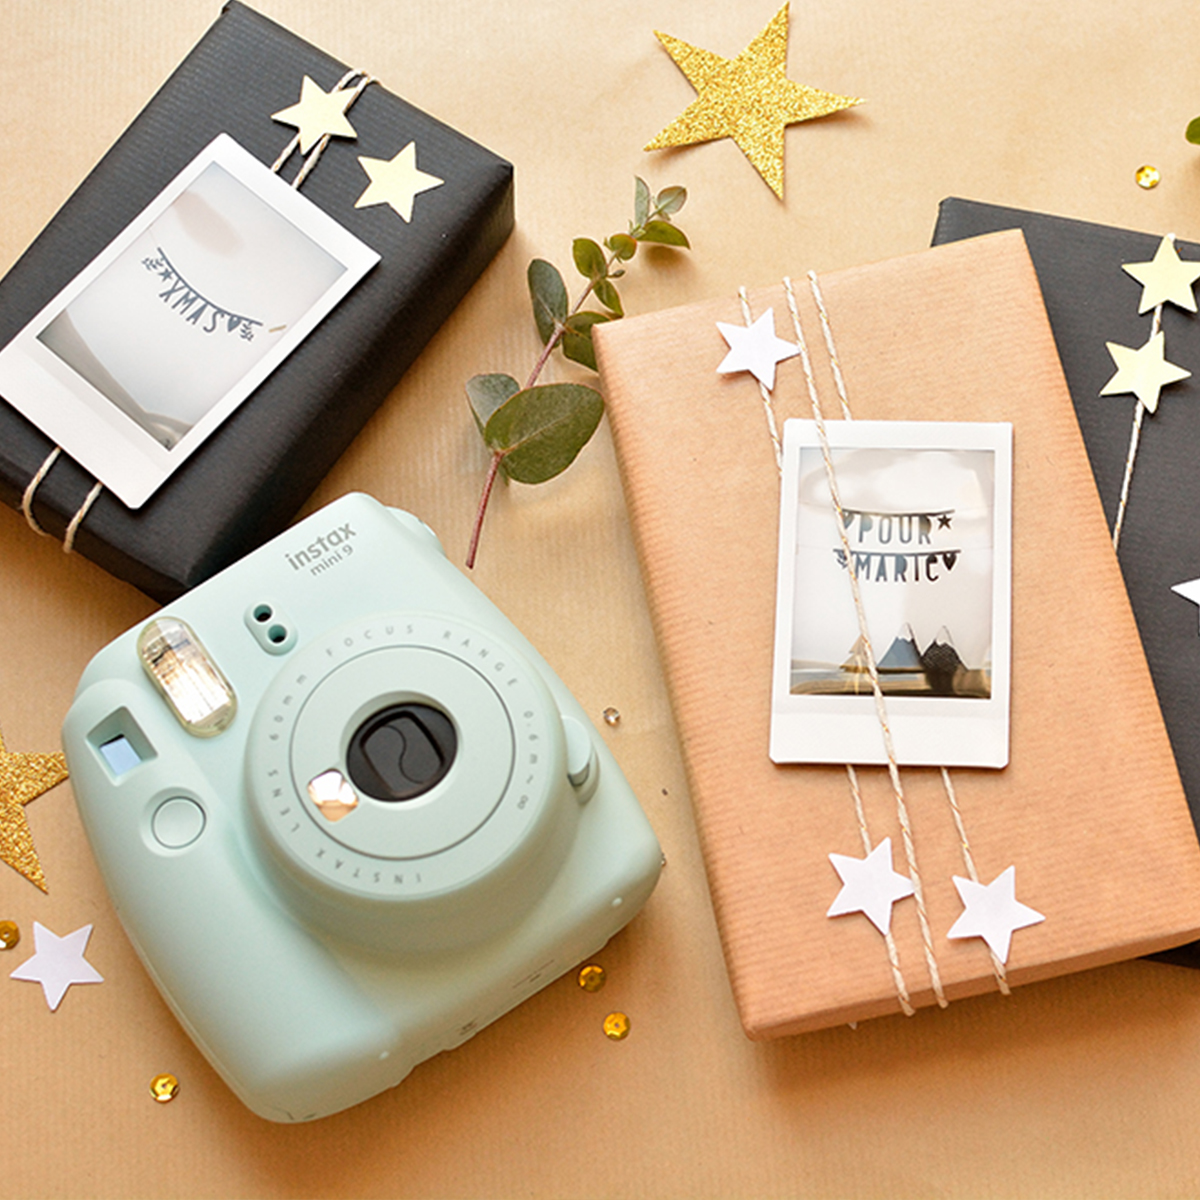 kerstcadeaus inpakken met polaroids